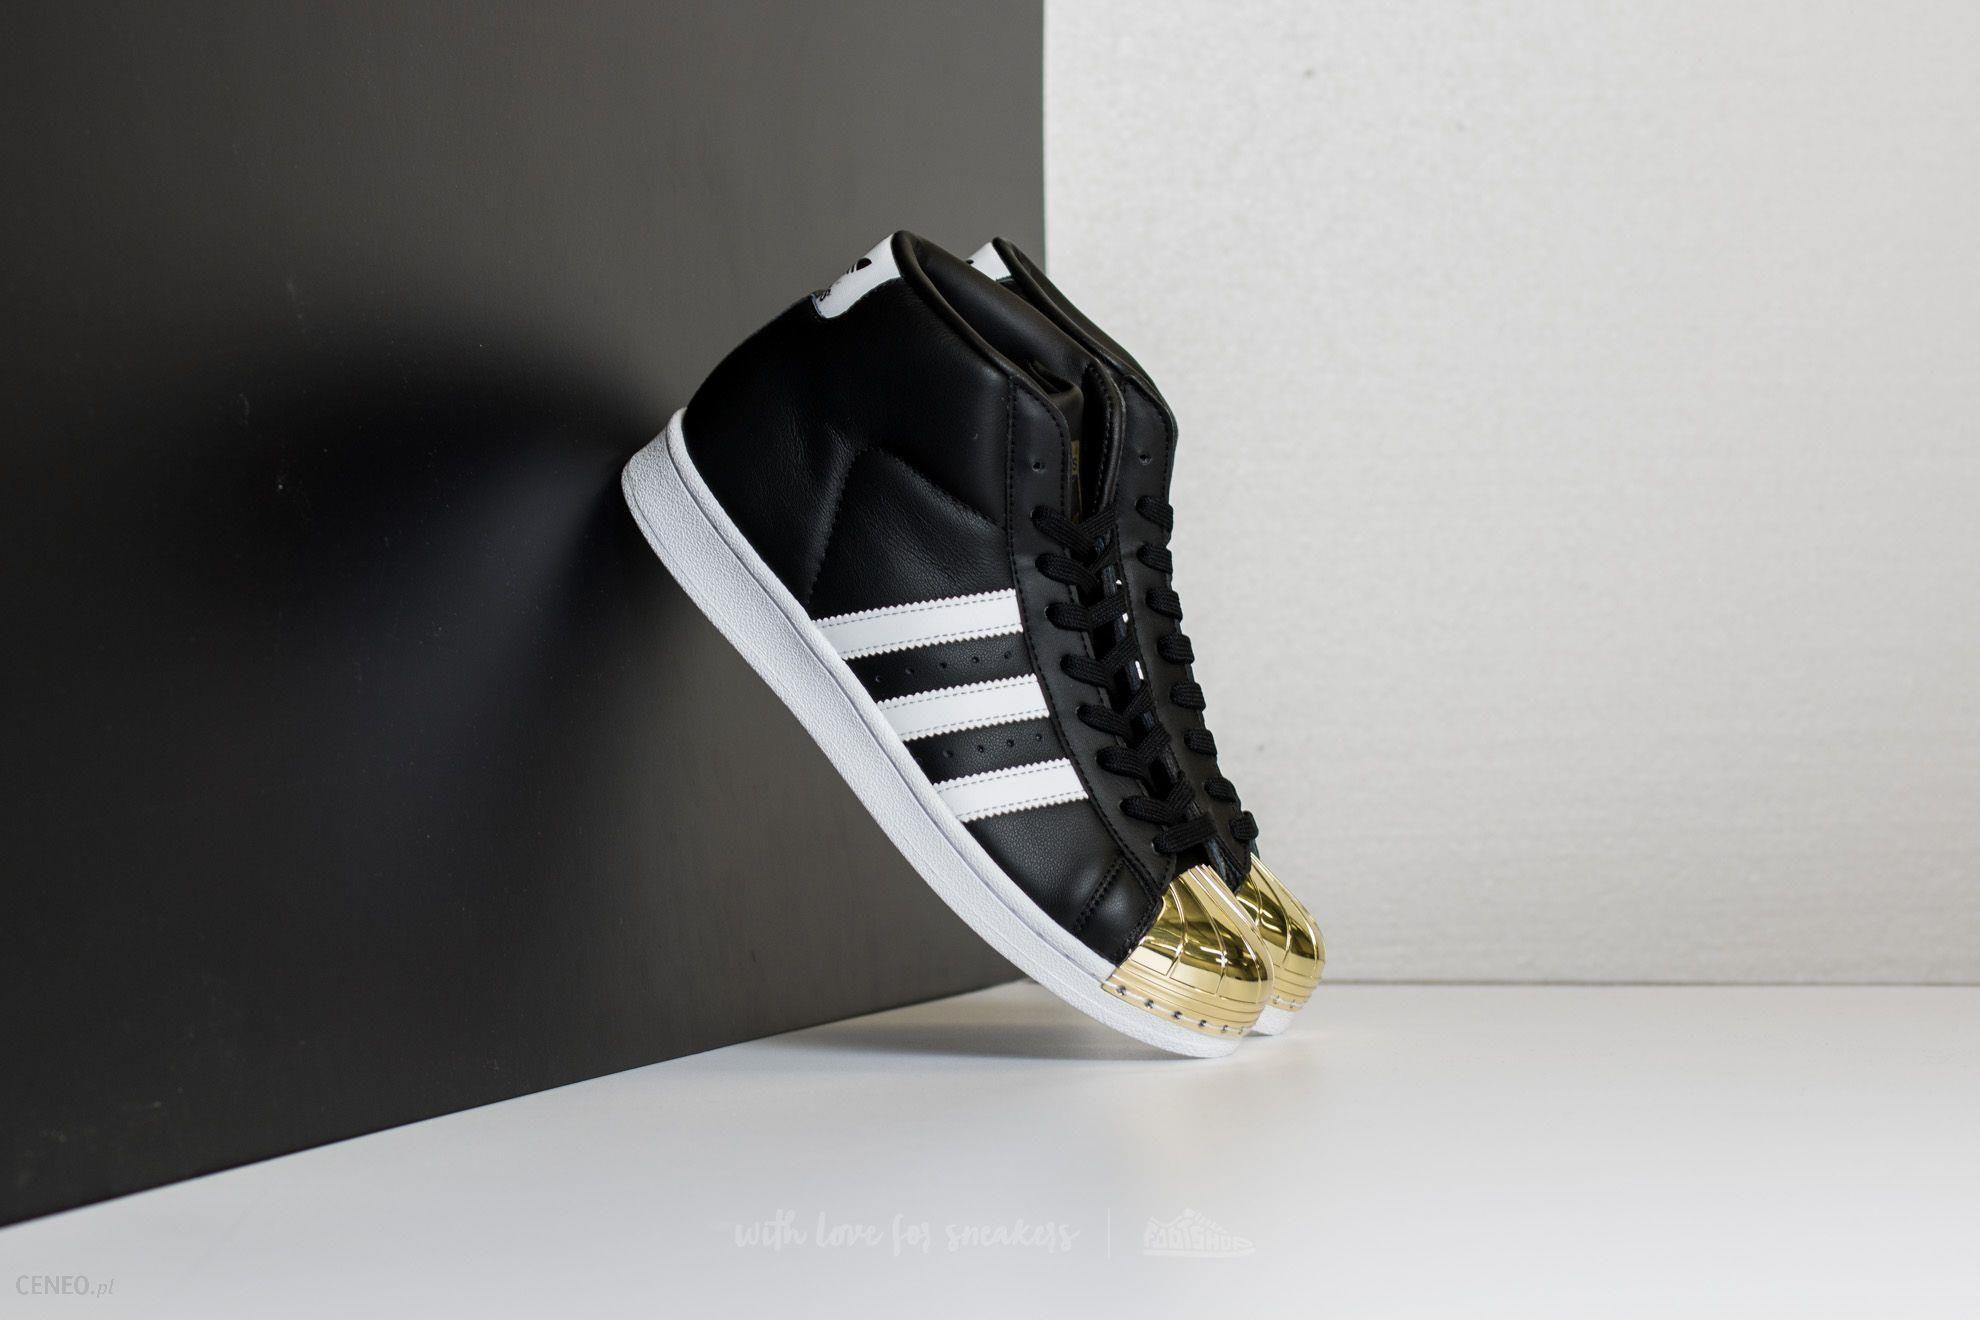 adidas Promodel Metal Toe W Core Black Ftw White Gold Metallic